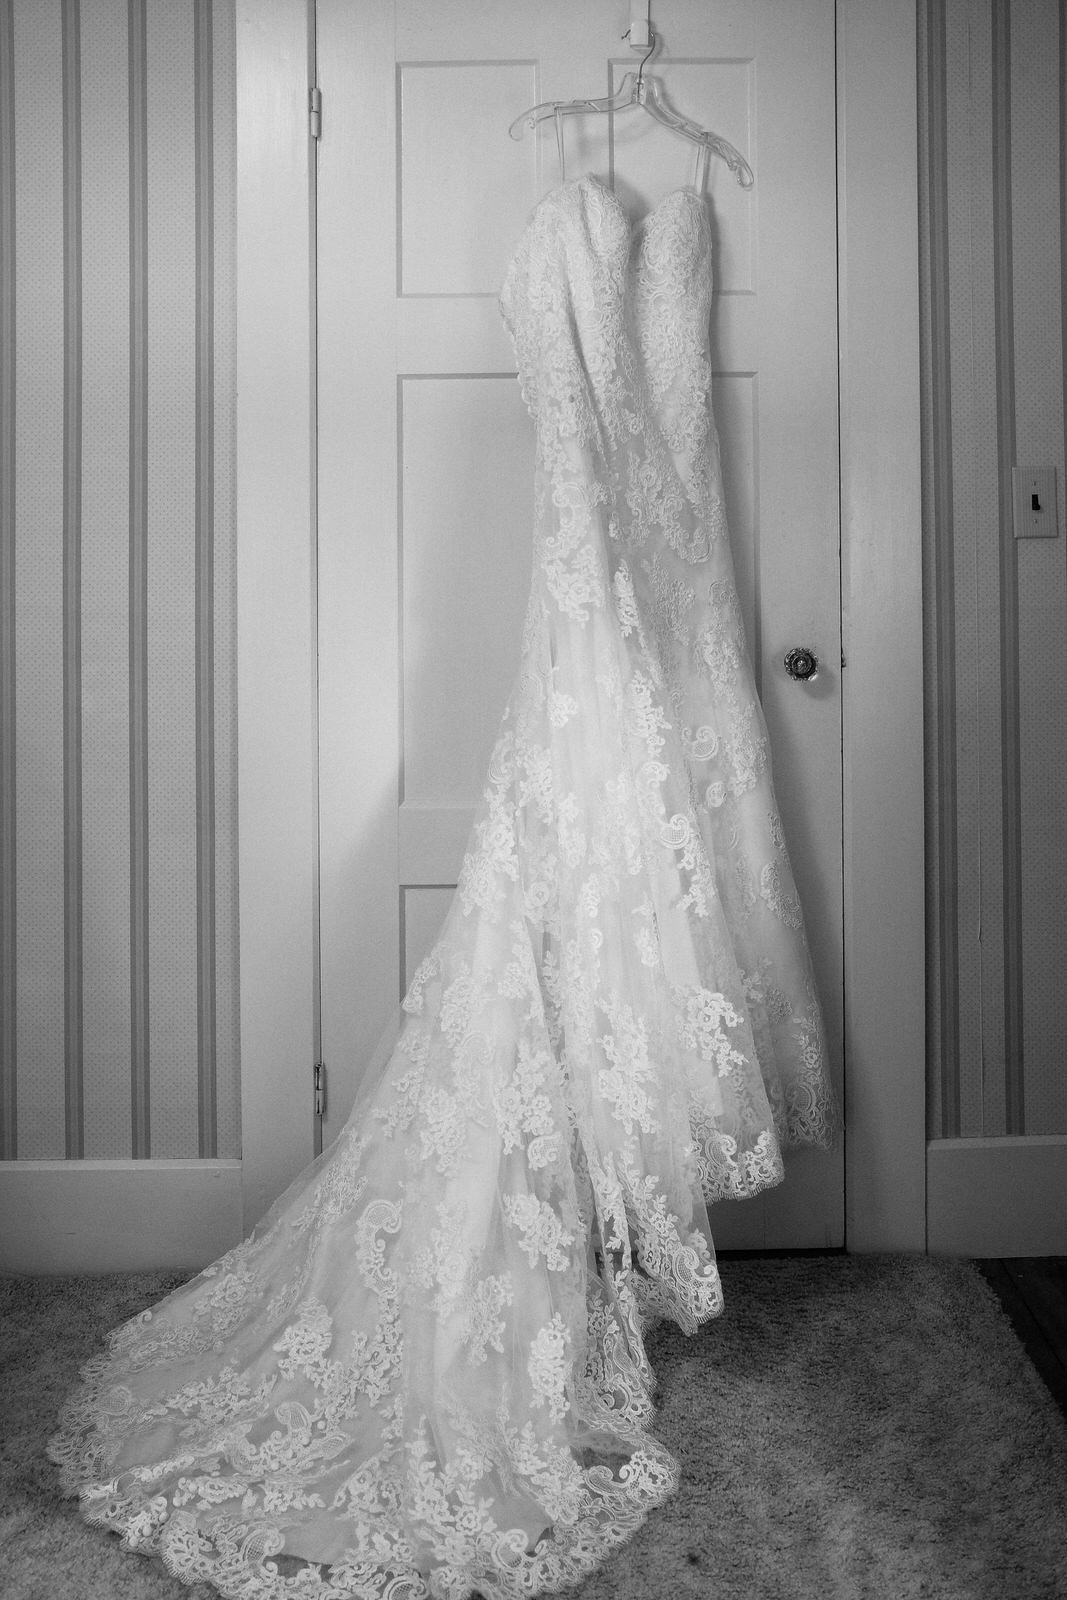 candid-vermont-wedding-photography-174.jpg